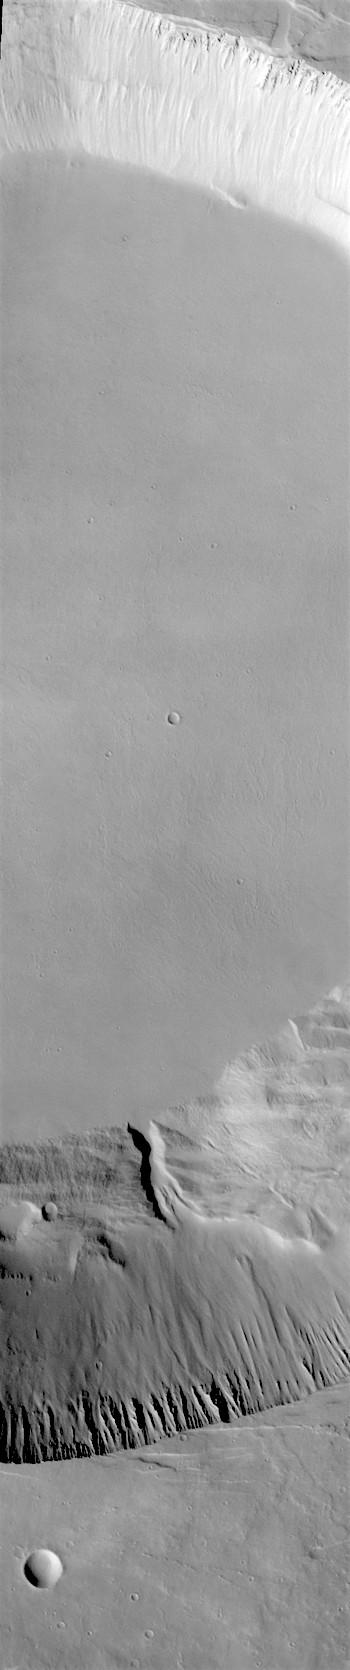 Pavonis Mons summit caldera (THEMIS_IOTD_20171106)